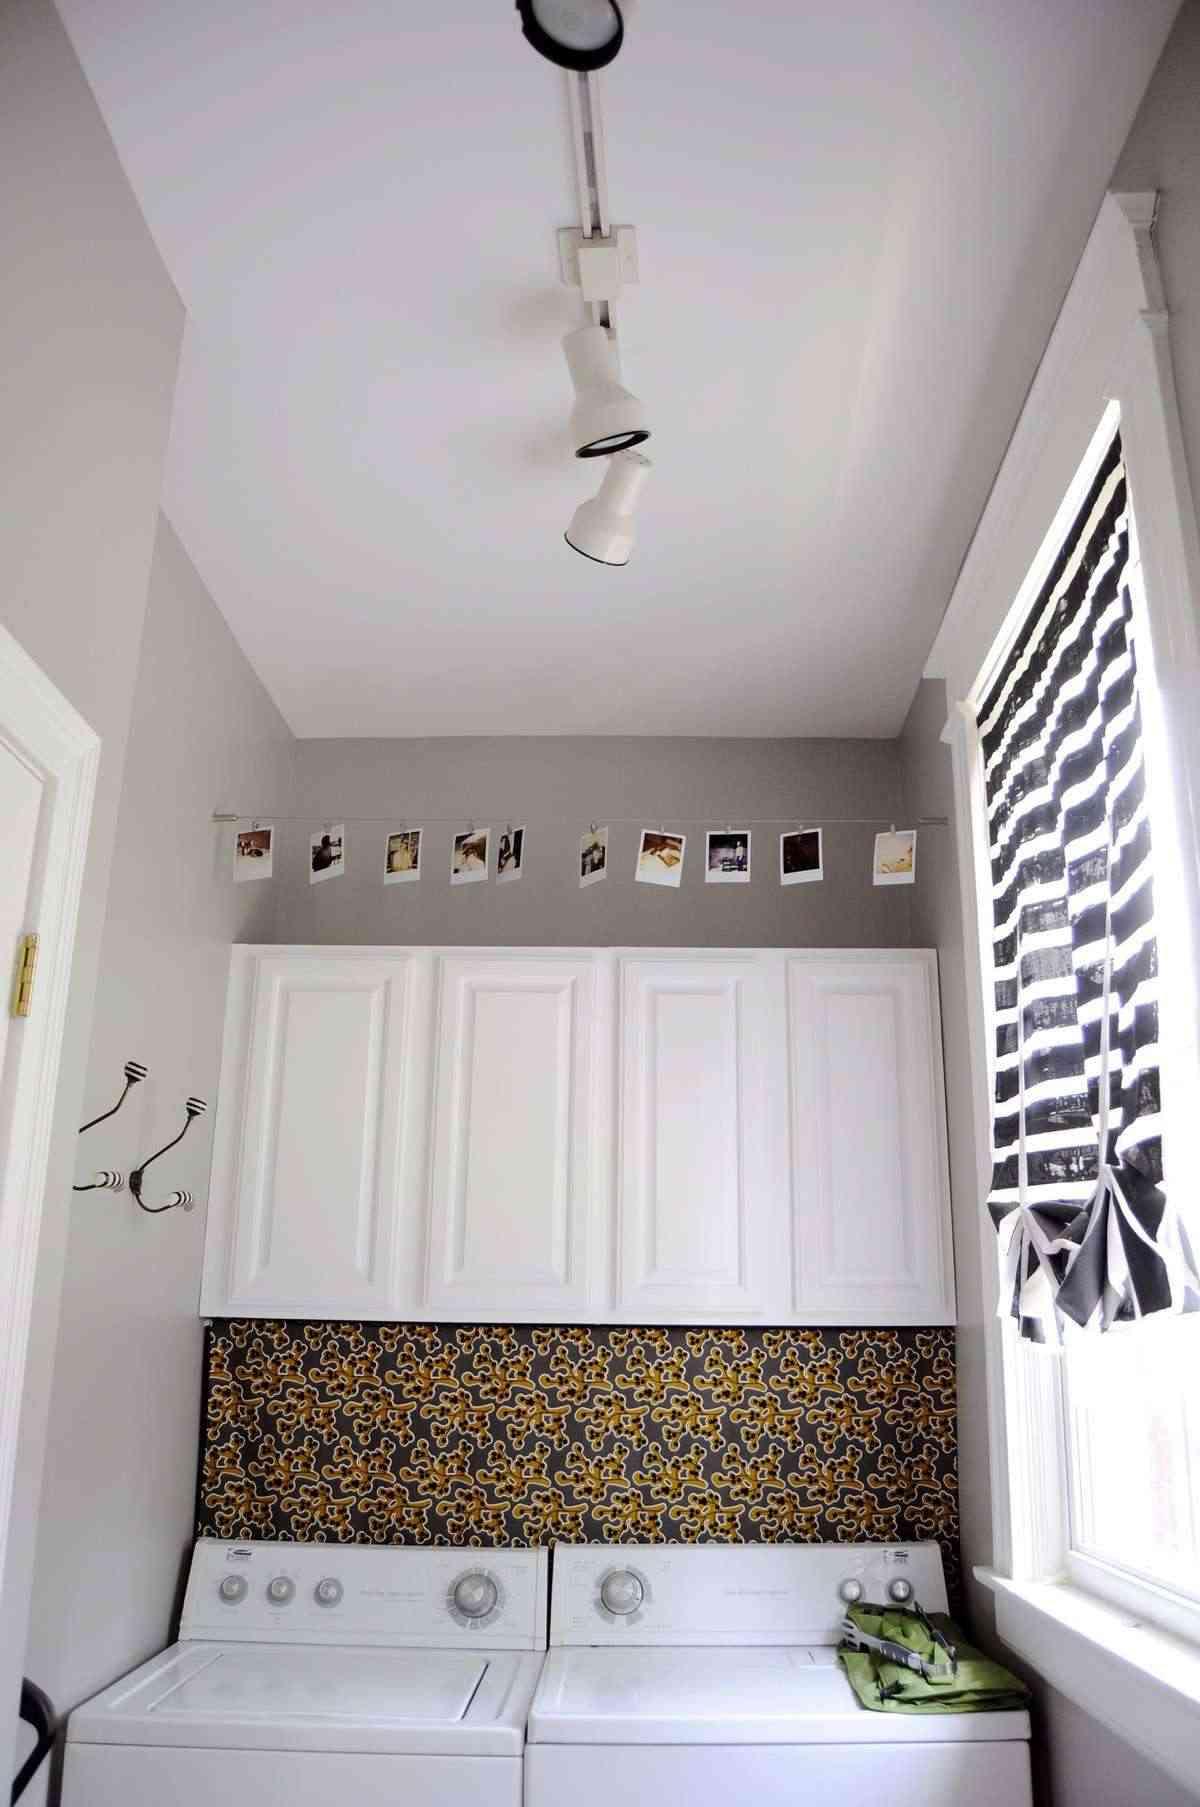 Dise os de cuartos de lavado peque os cool gals for Diseno de muebles para cuarto de lavado